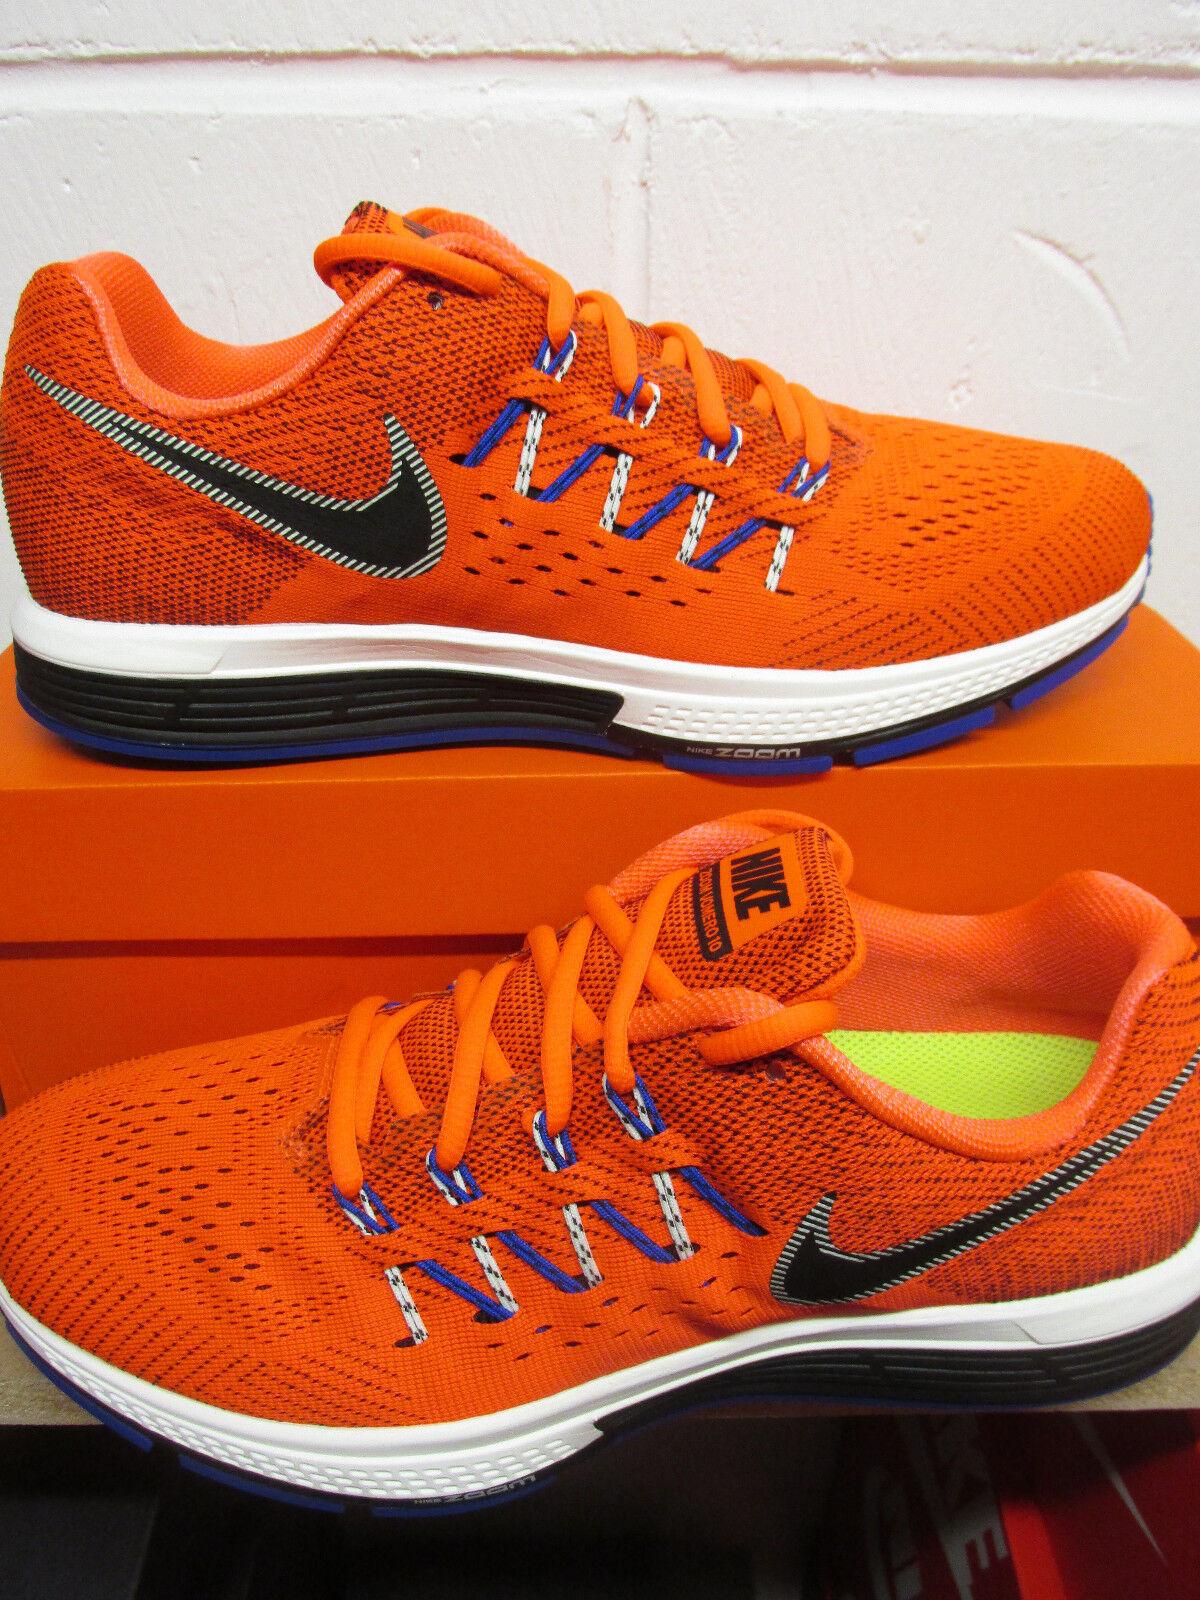 Nike Luft Zoom Vomero 10 Herren Laufschuhe 717440 801 Turnschuhe Neuartiges Design